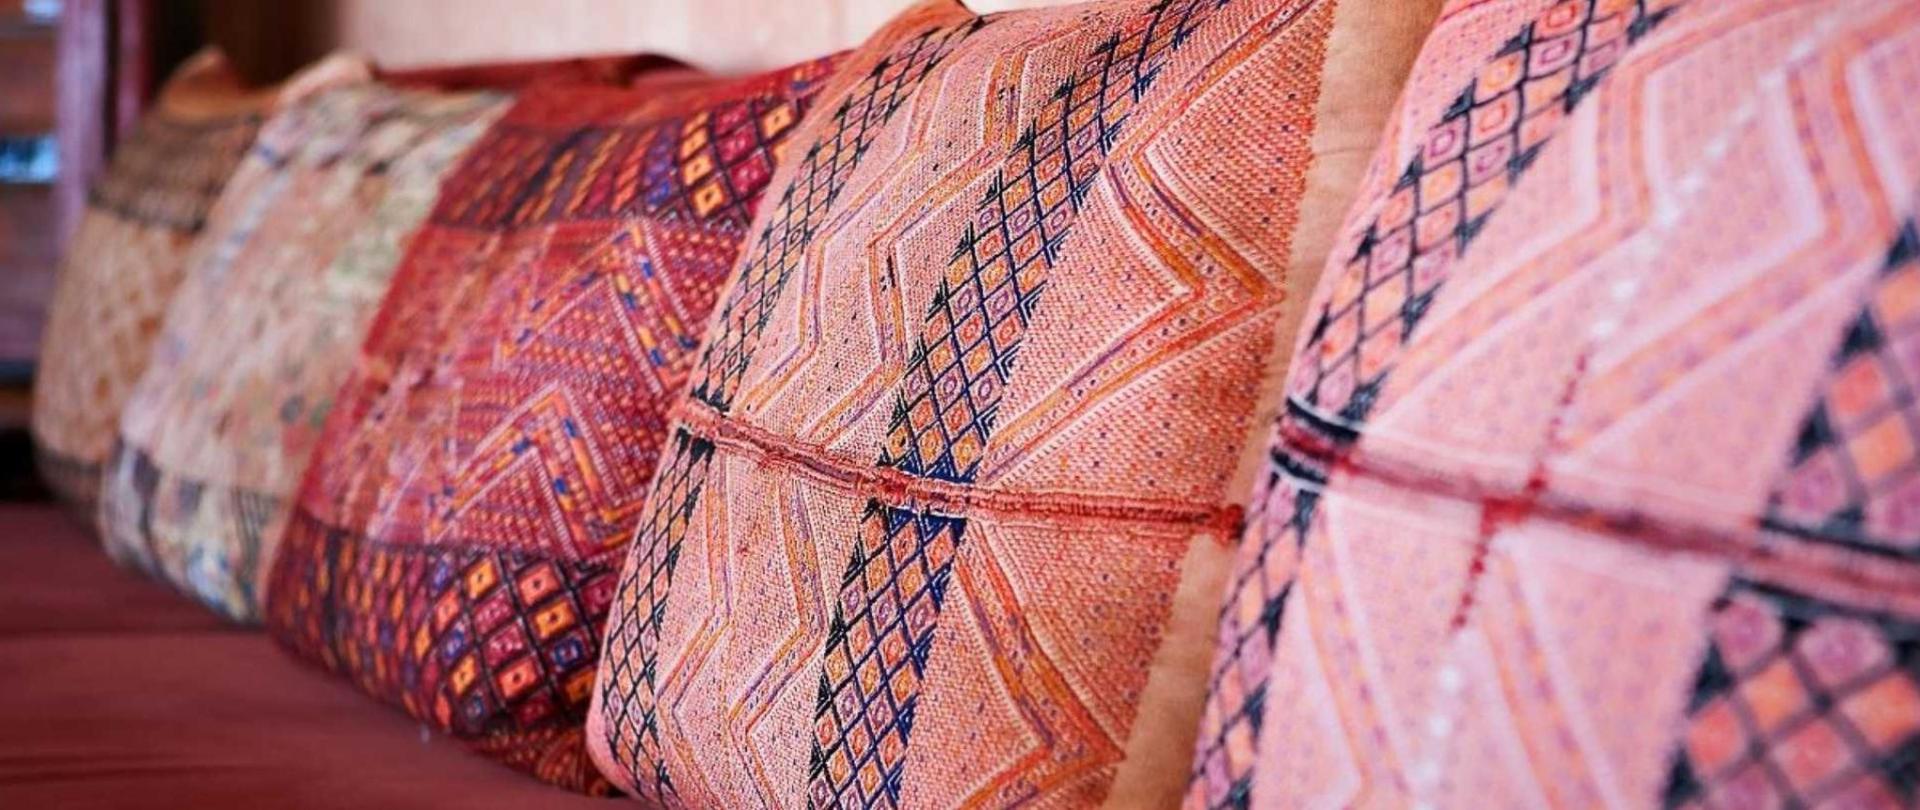 living-room-sofa-fabric-detail1.jpg.1920x807_default.jpg